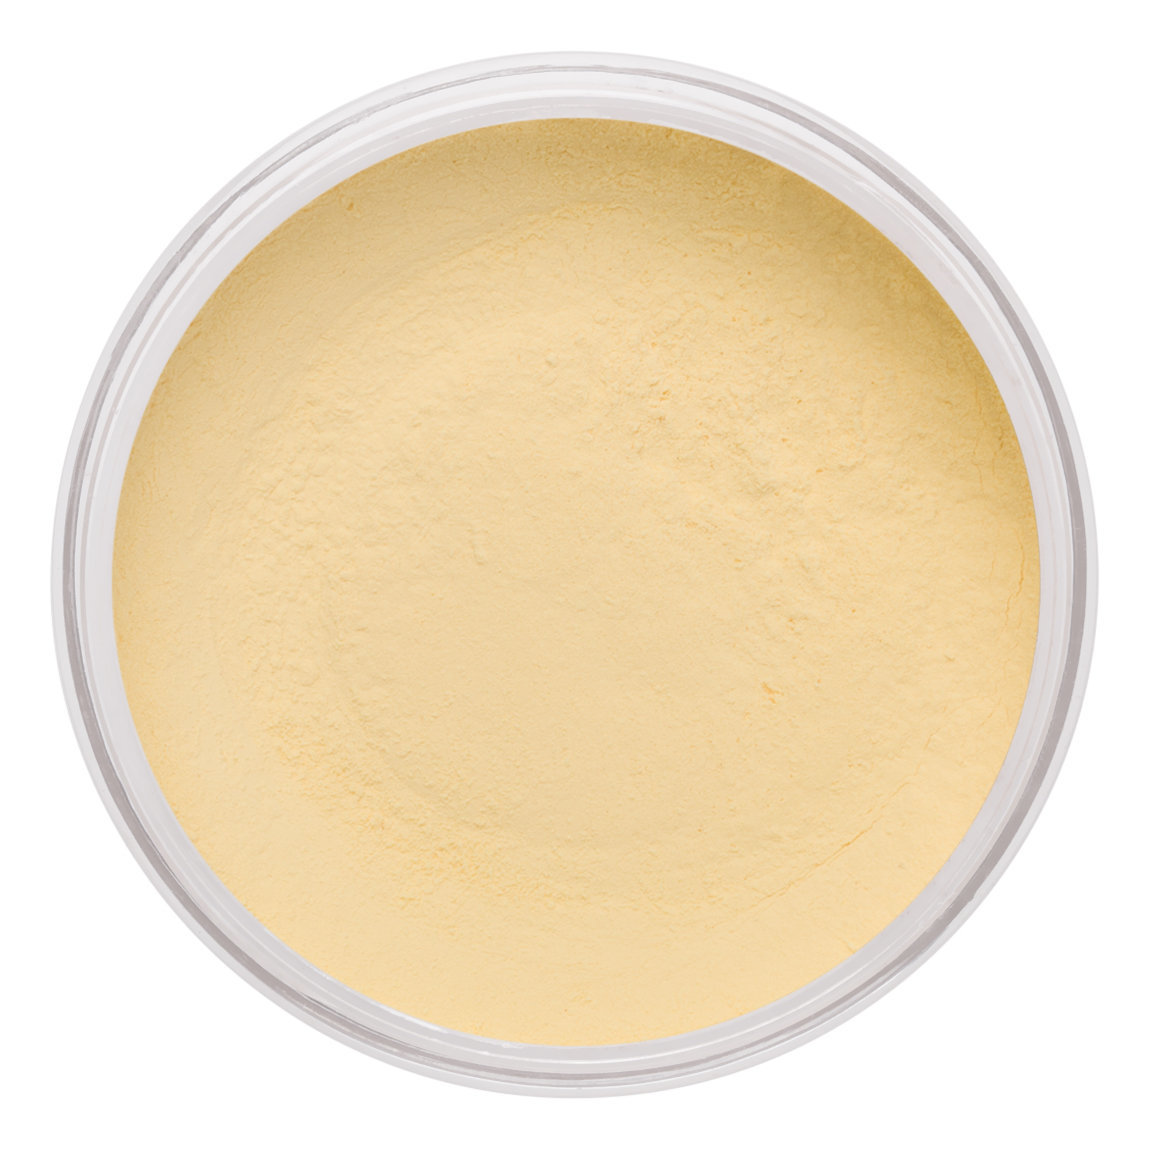 Danessa Myricks Beauty Evolution Powder Yellow product swatch.